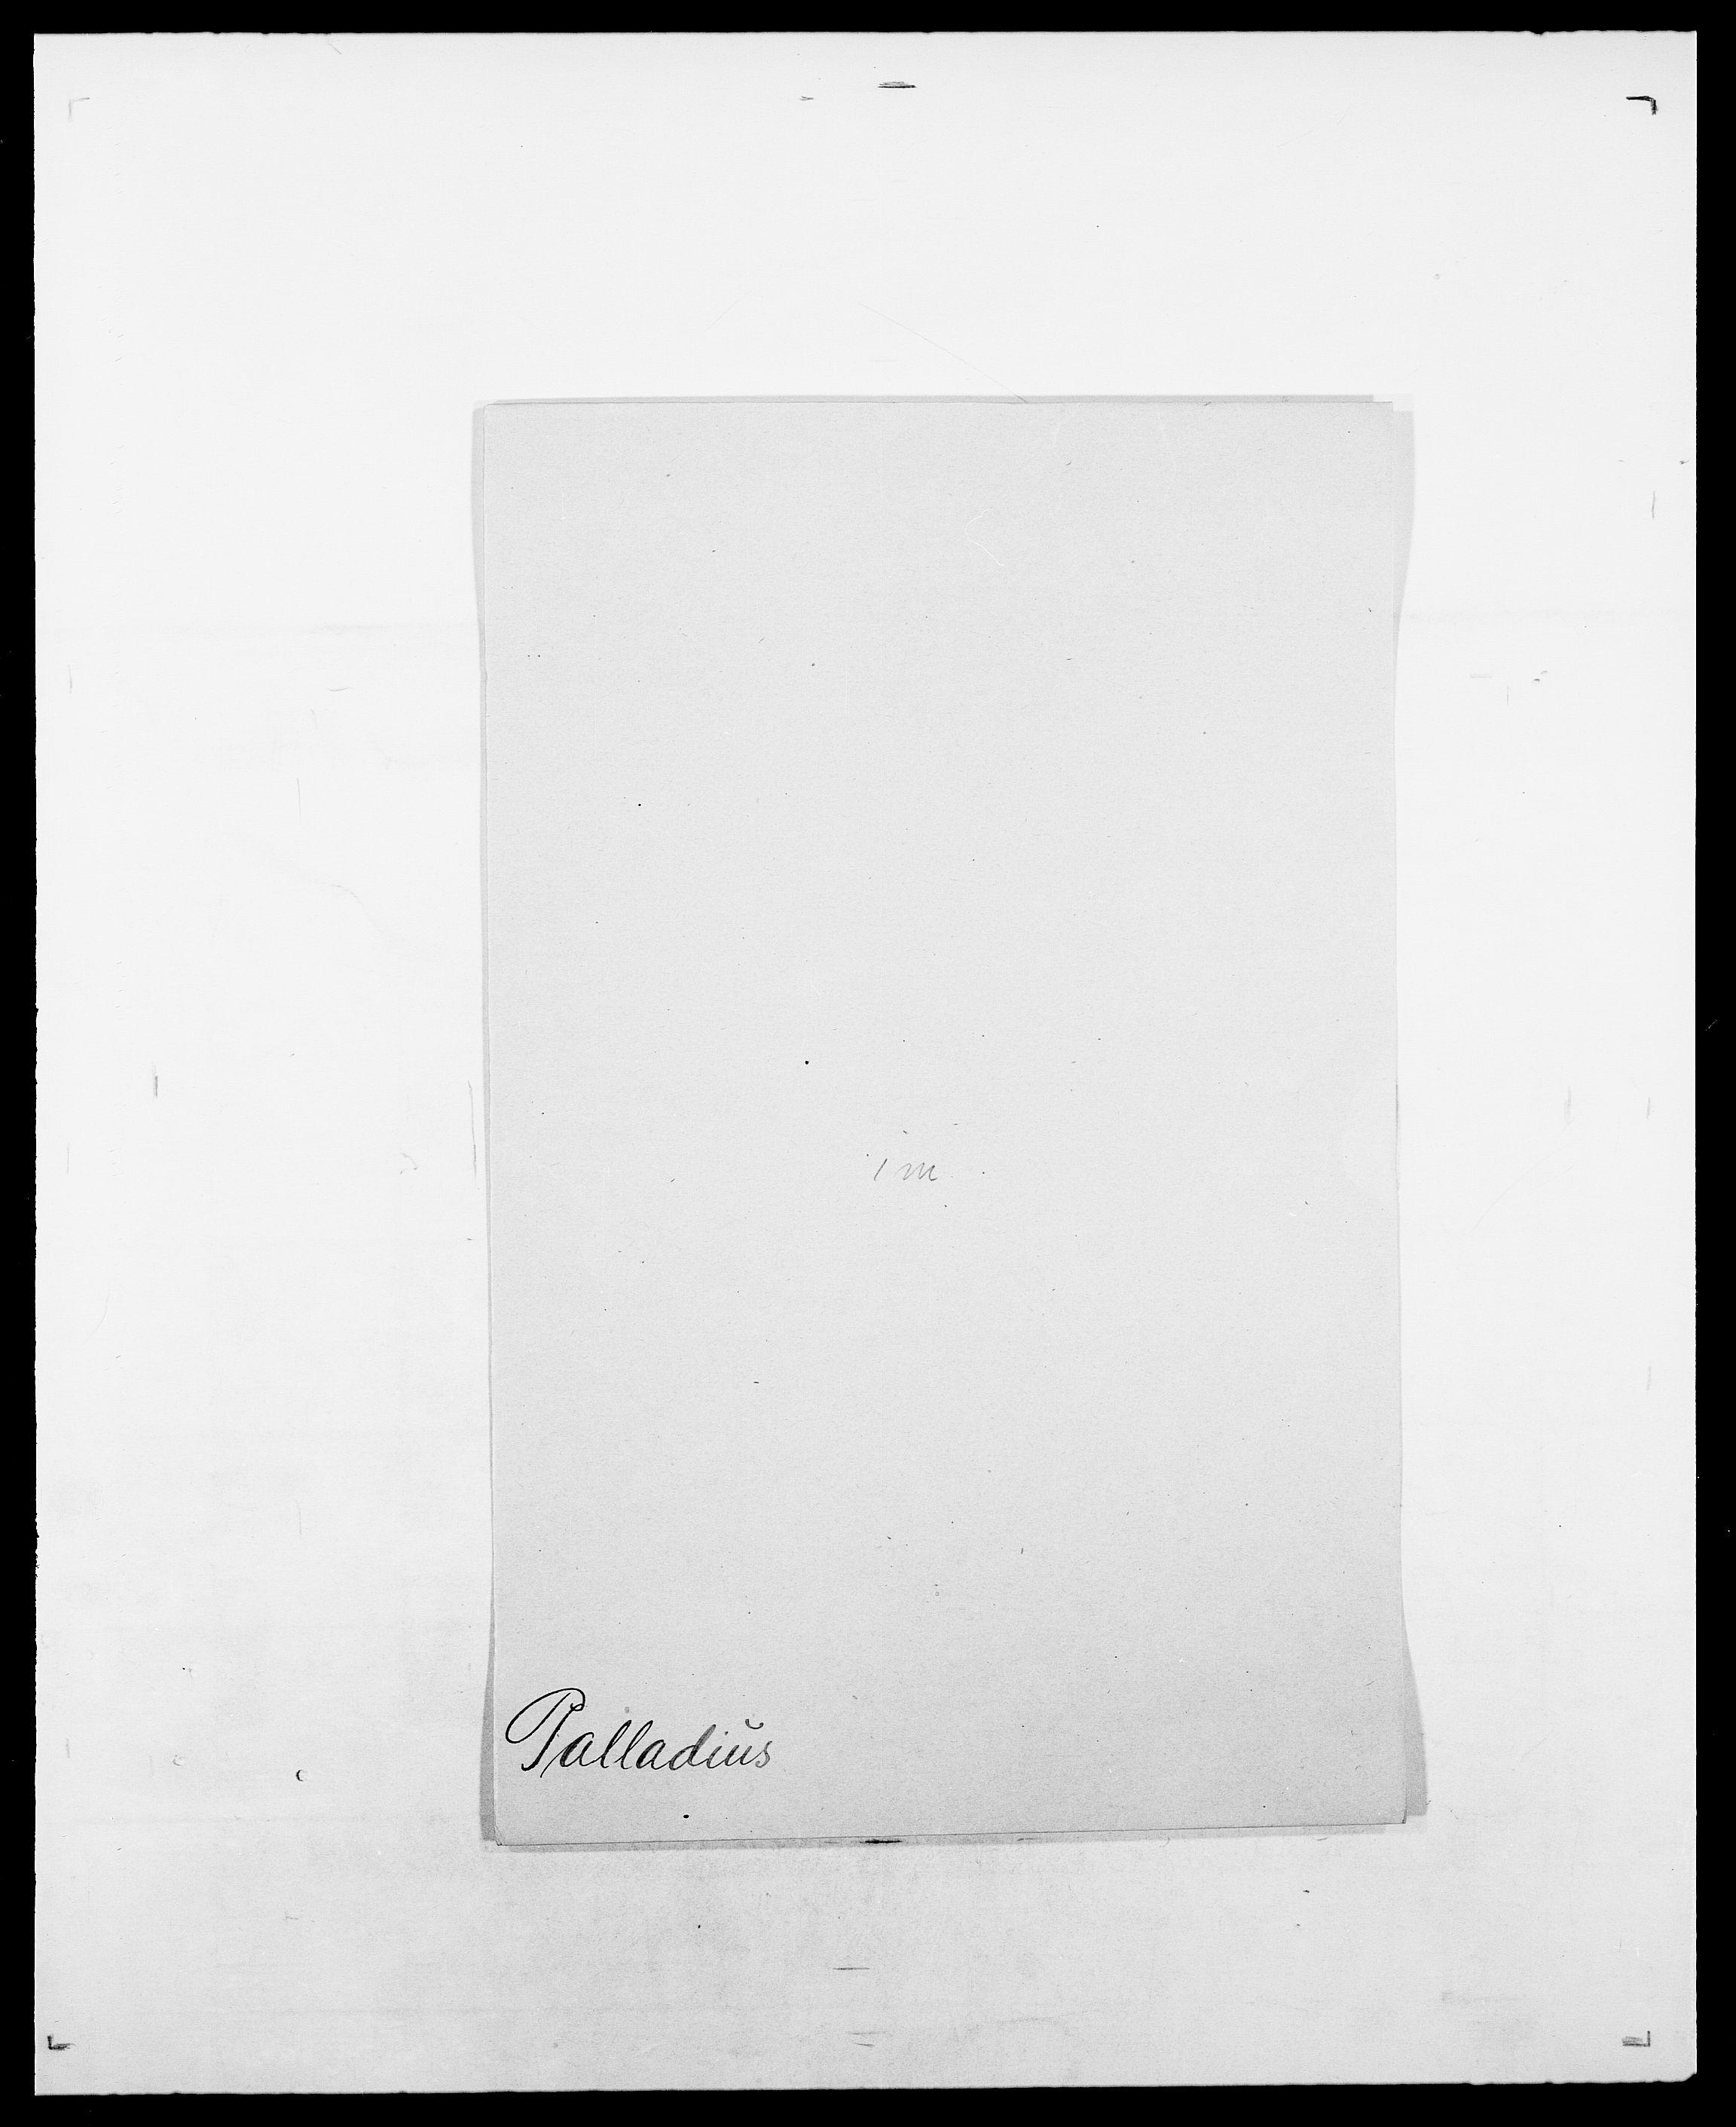 SAO, Delgobe, Charles Antoine - samling, D/Da/L0030: Paars - Pittelkov, s. 60